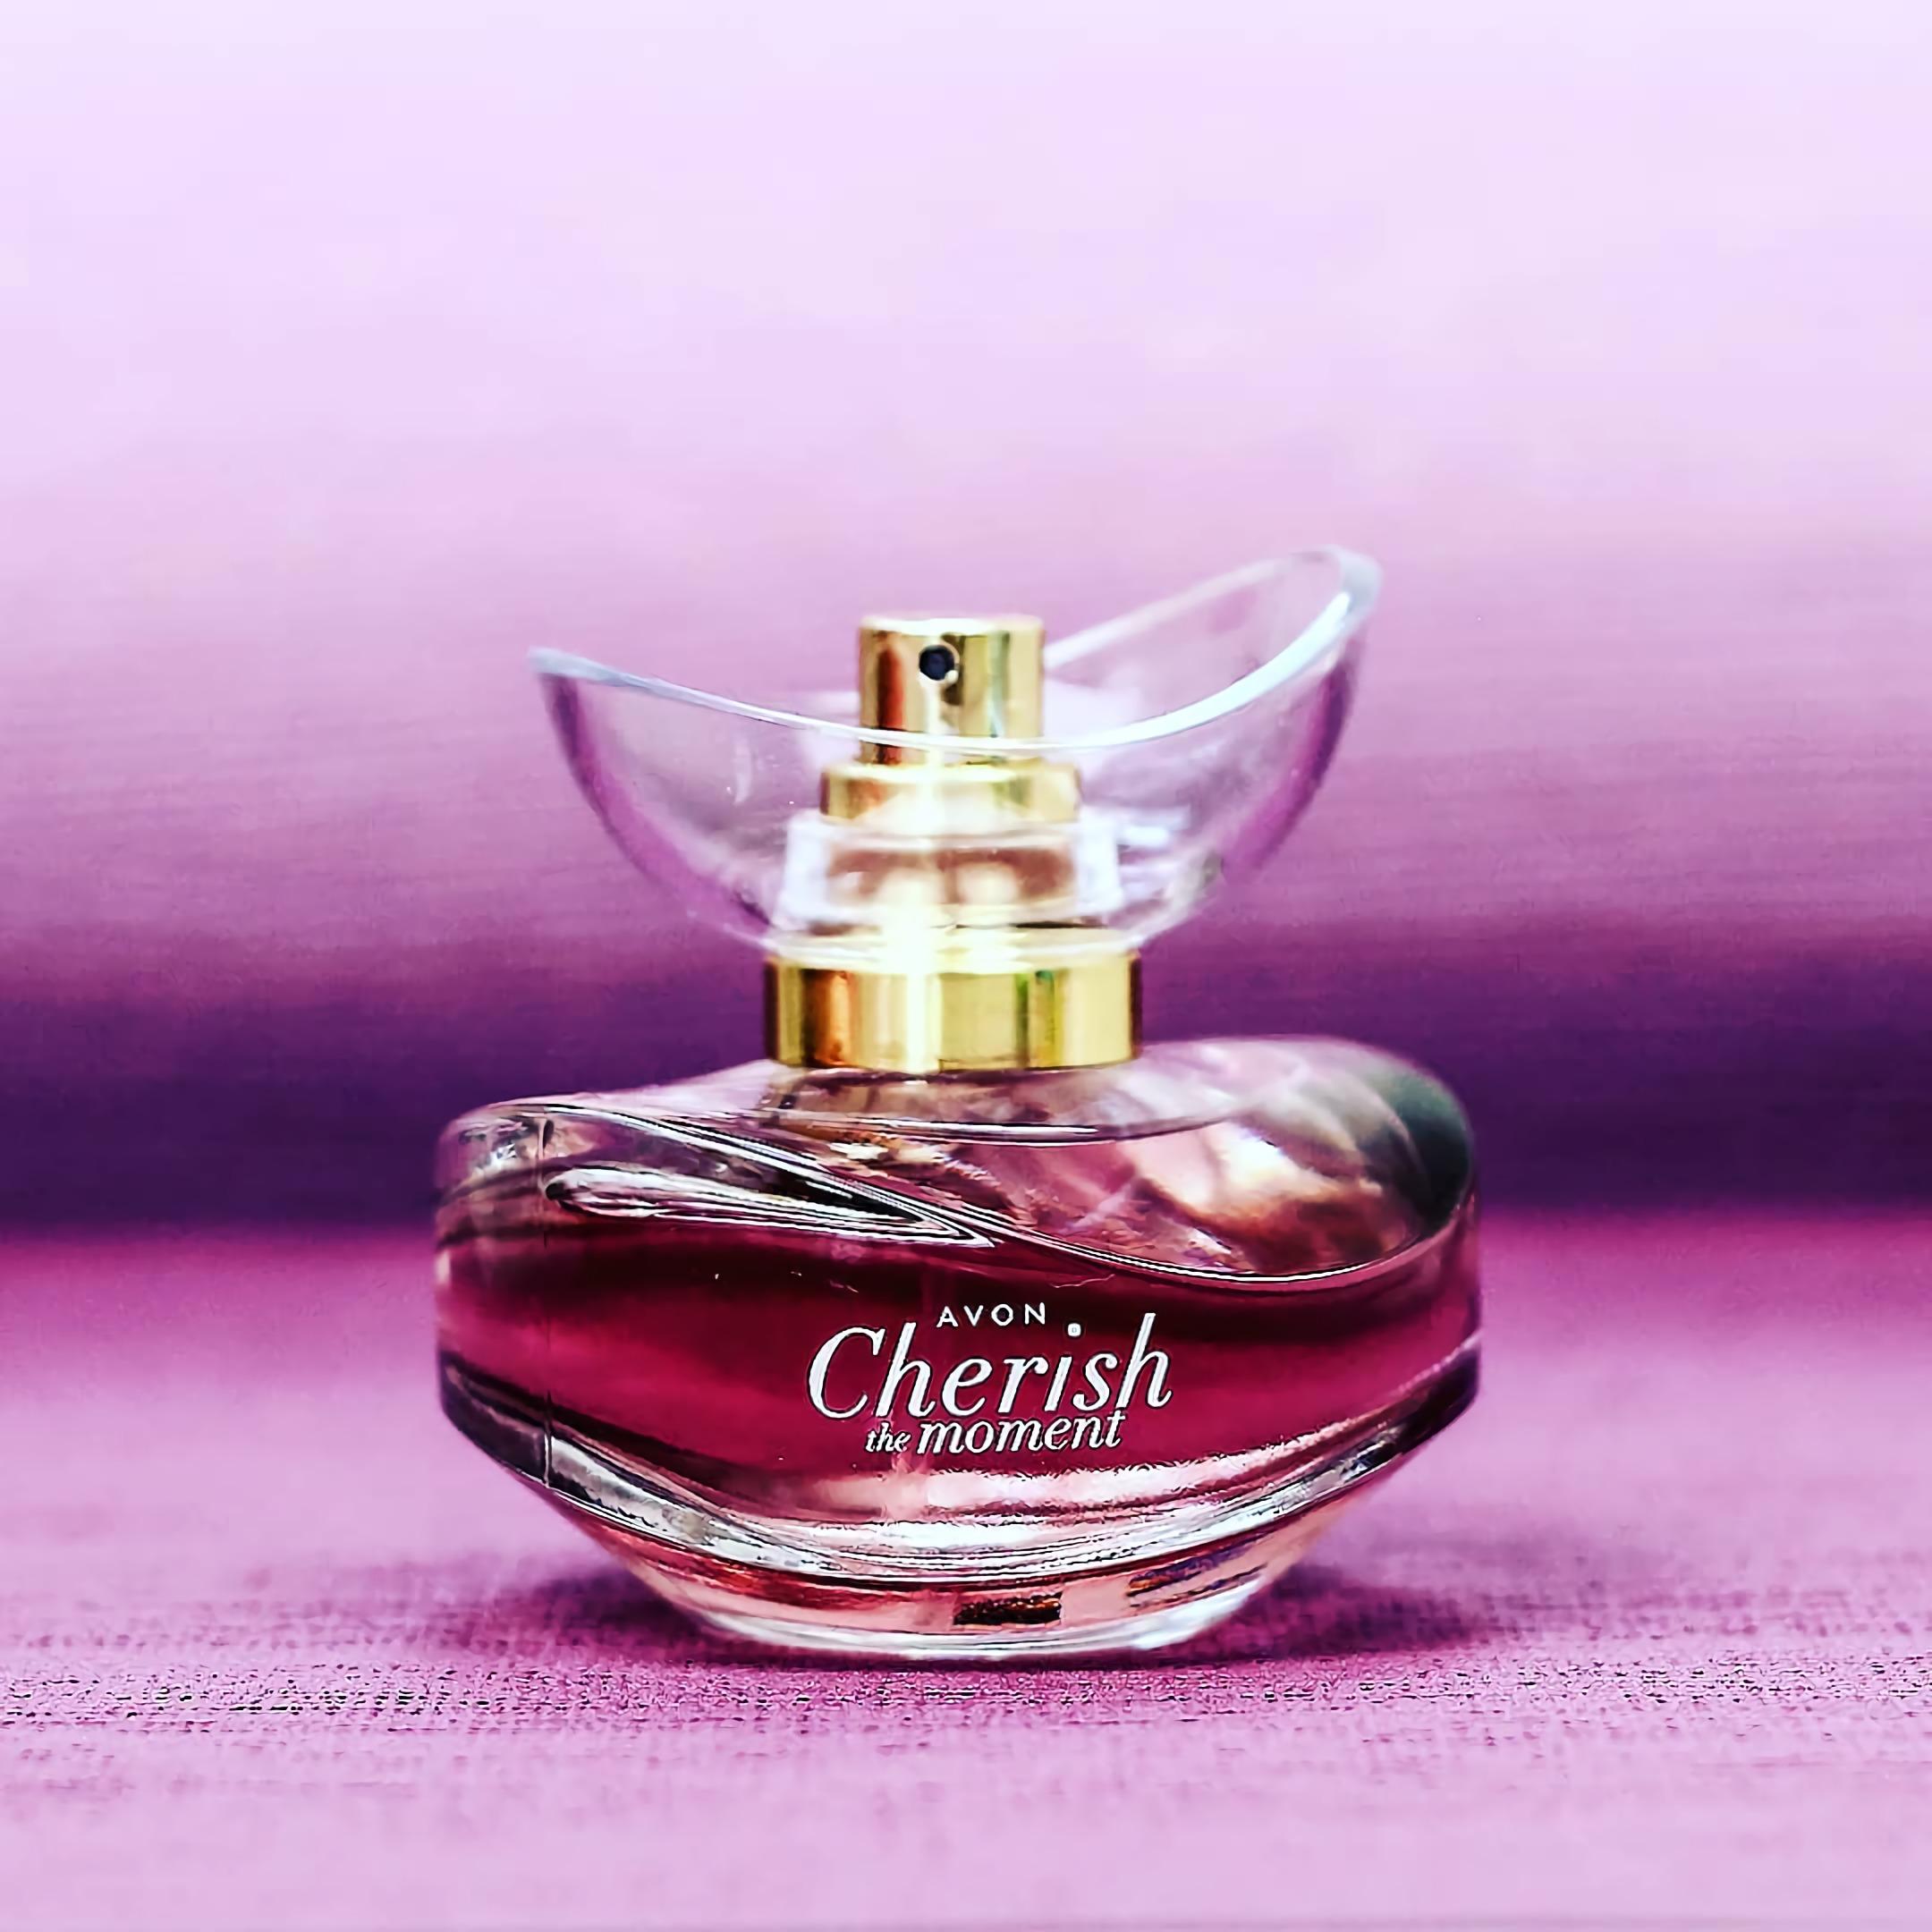 парфюмированная вода для девушек Avon Cherish The Moment